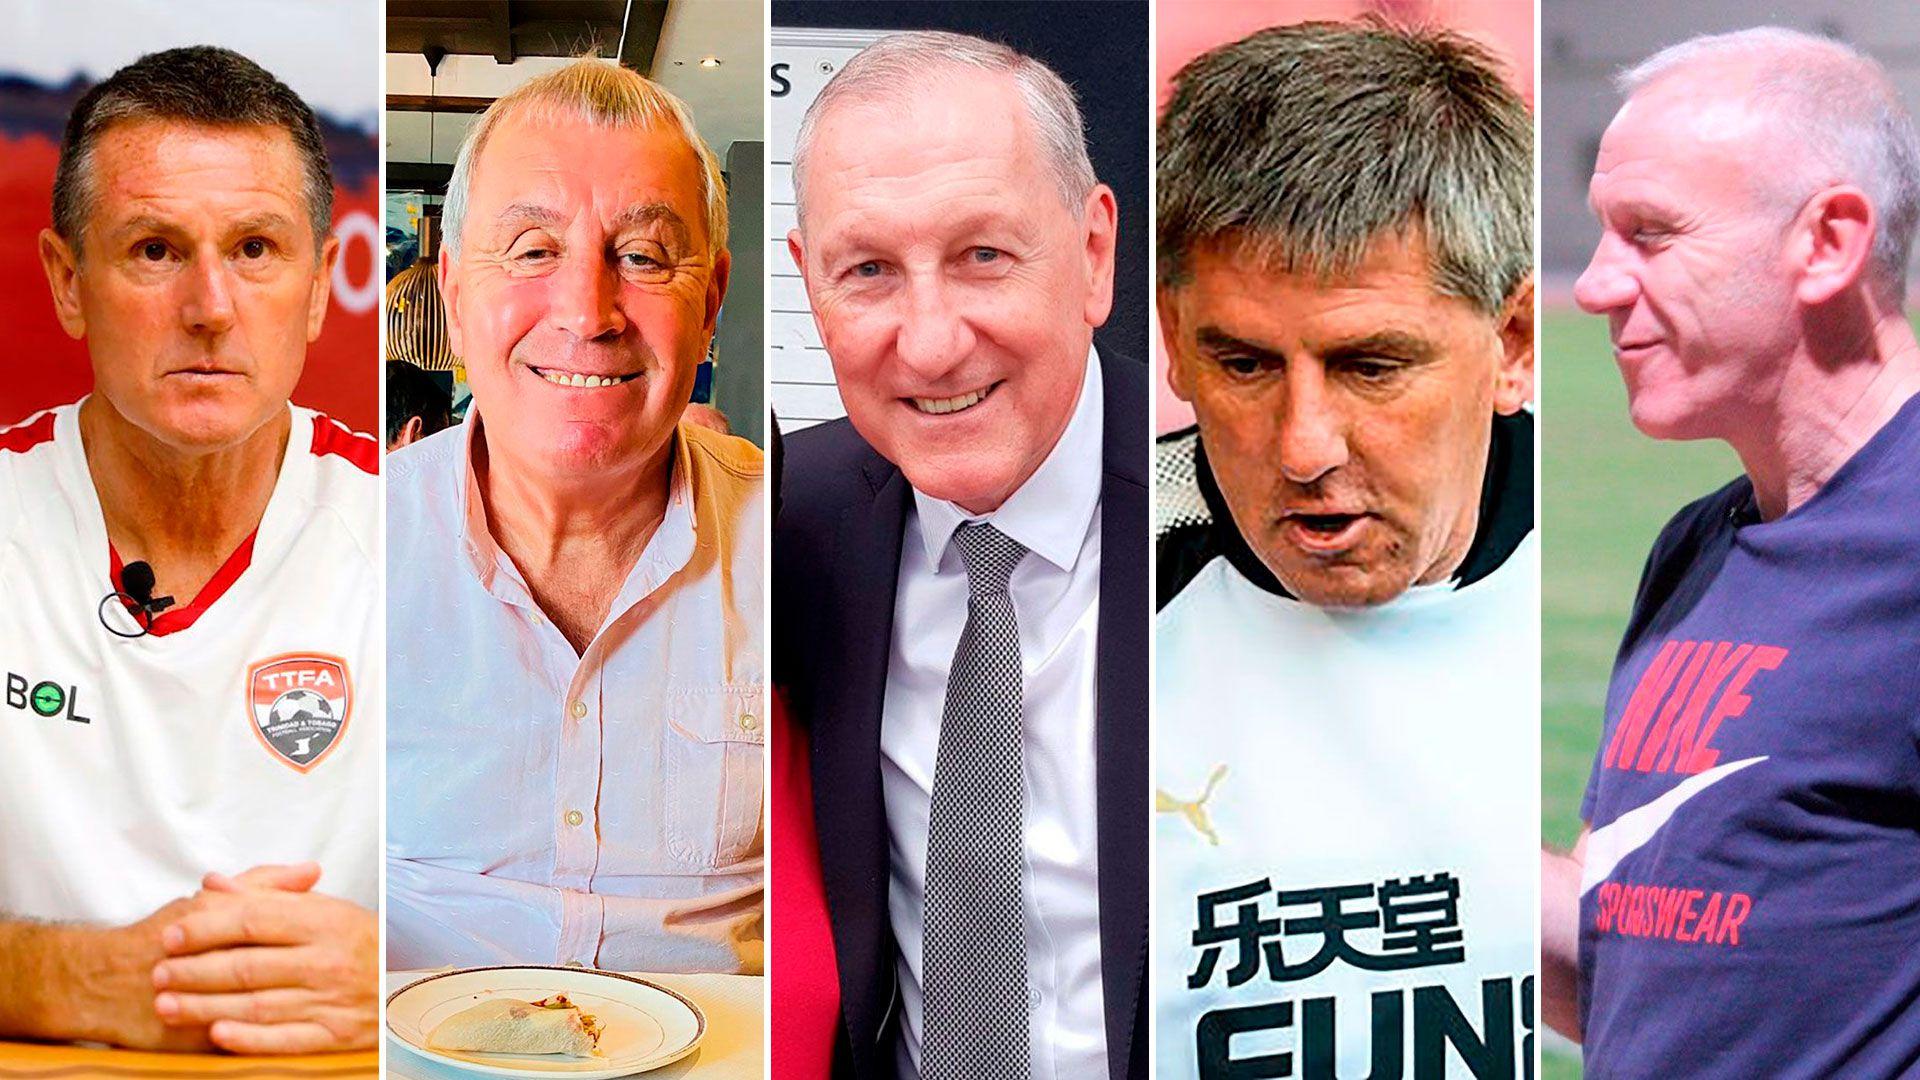 Peter Beardsley, Peter Reid, Terry Butcher, Terry Fenwick y el arquero Peter Shilton